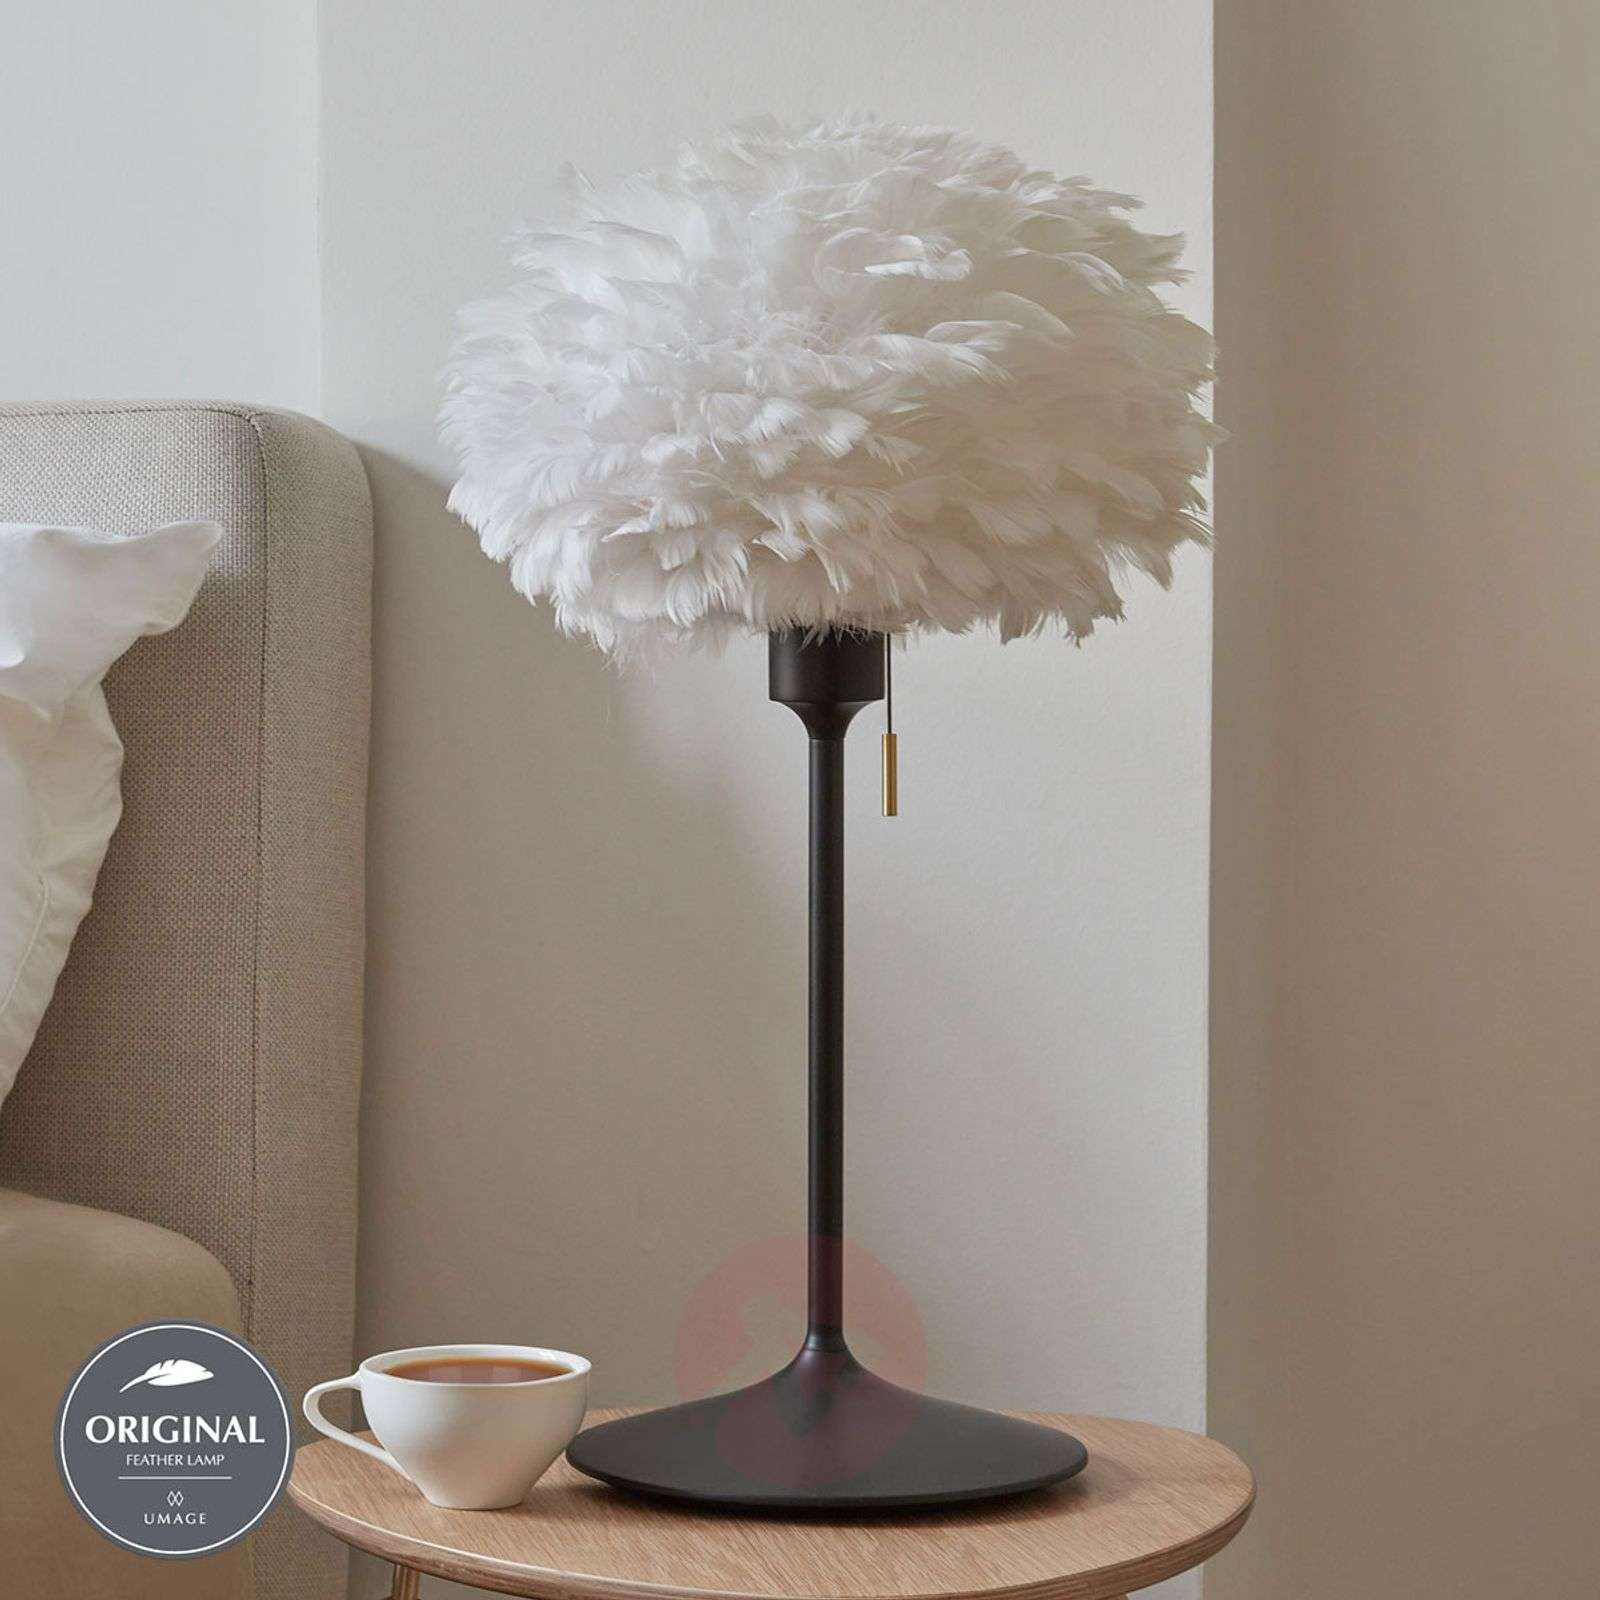 UMAGE Eos mini pöytälamppu valk. Champagne musta-9521226-01